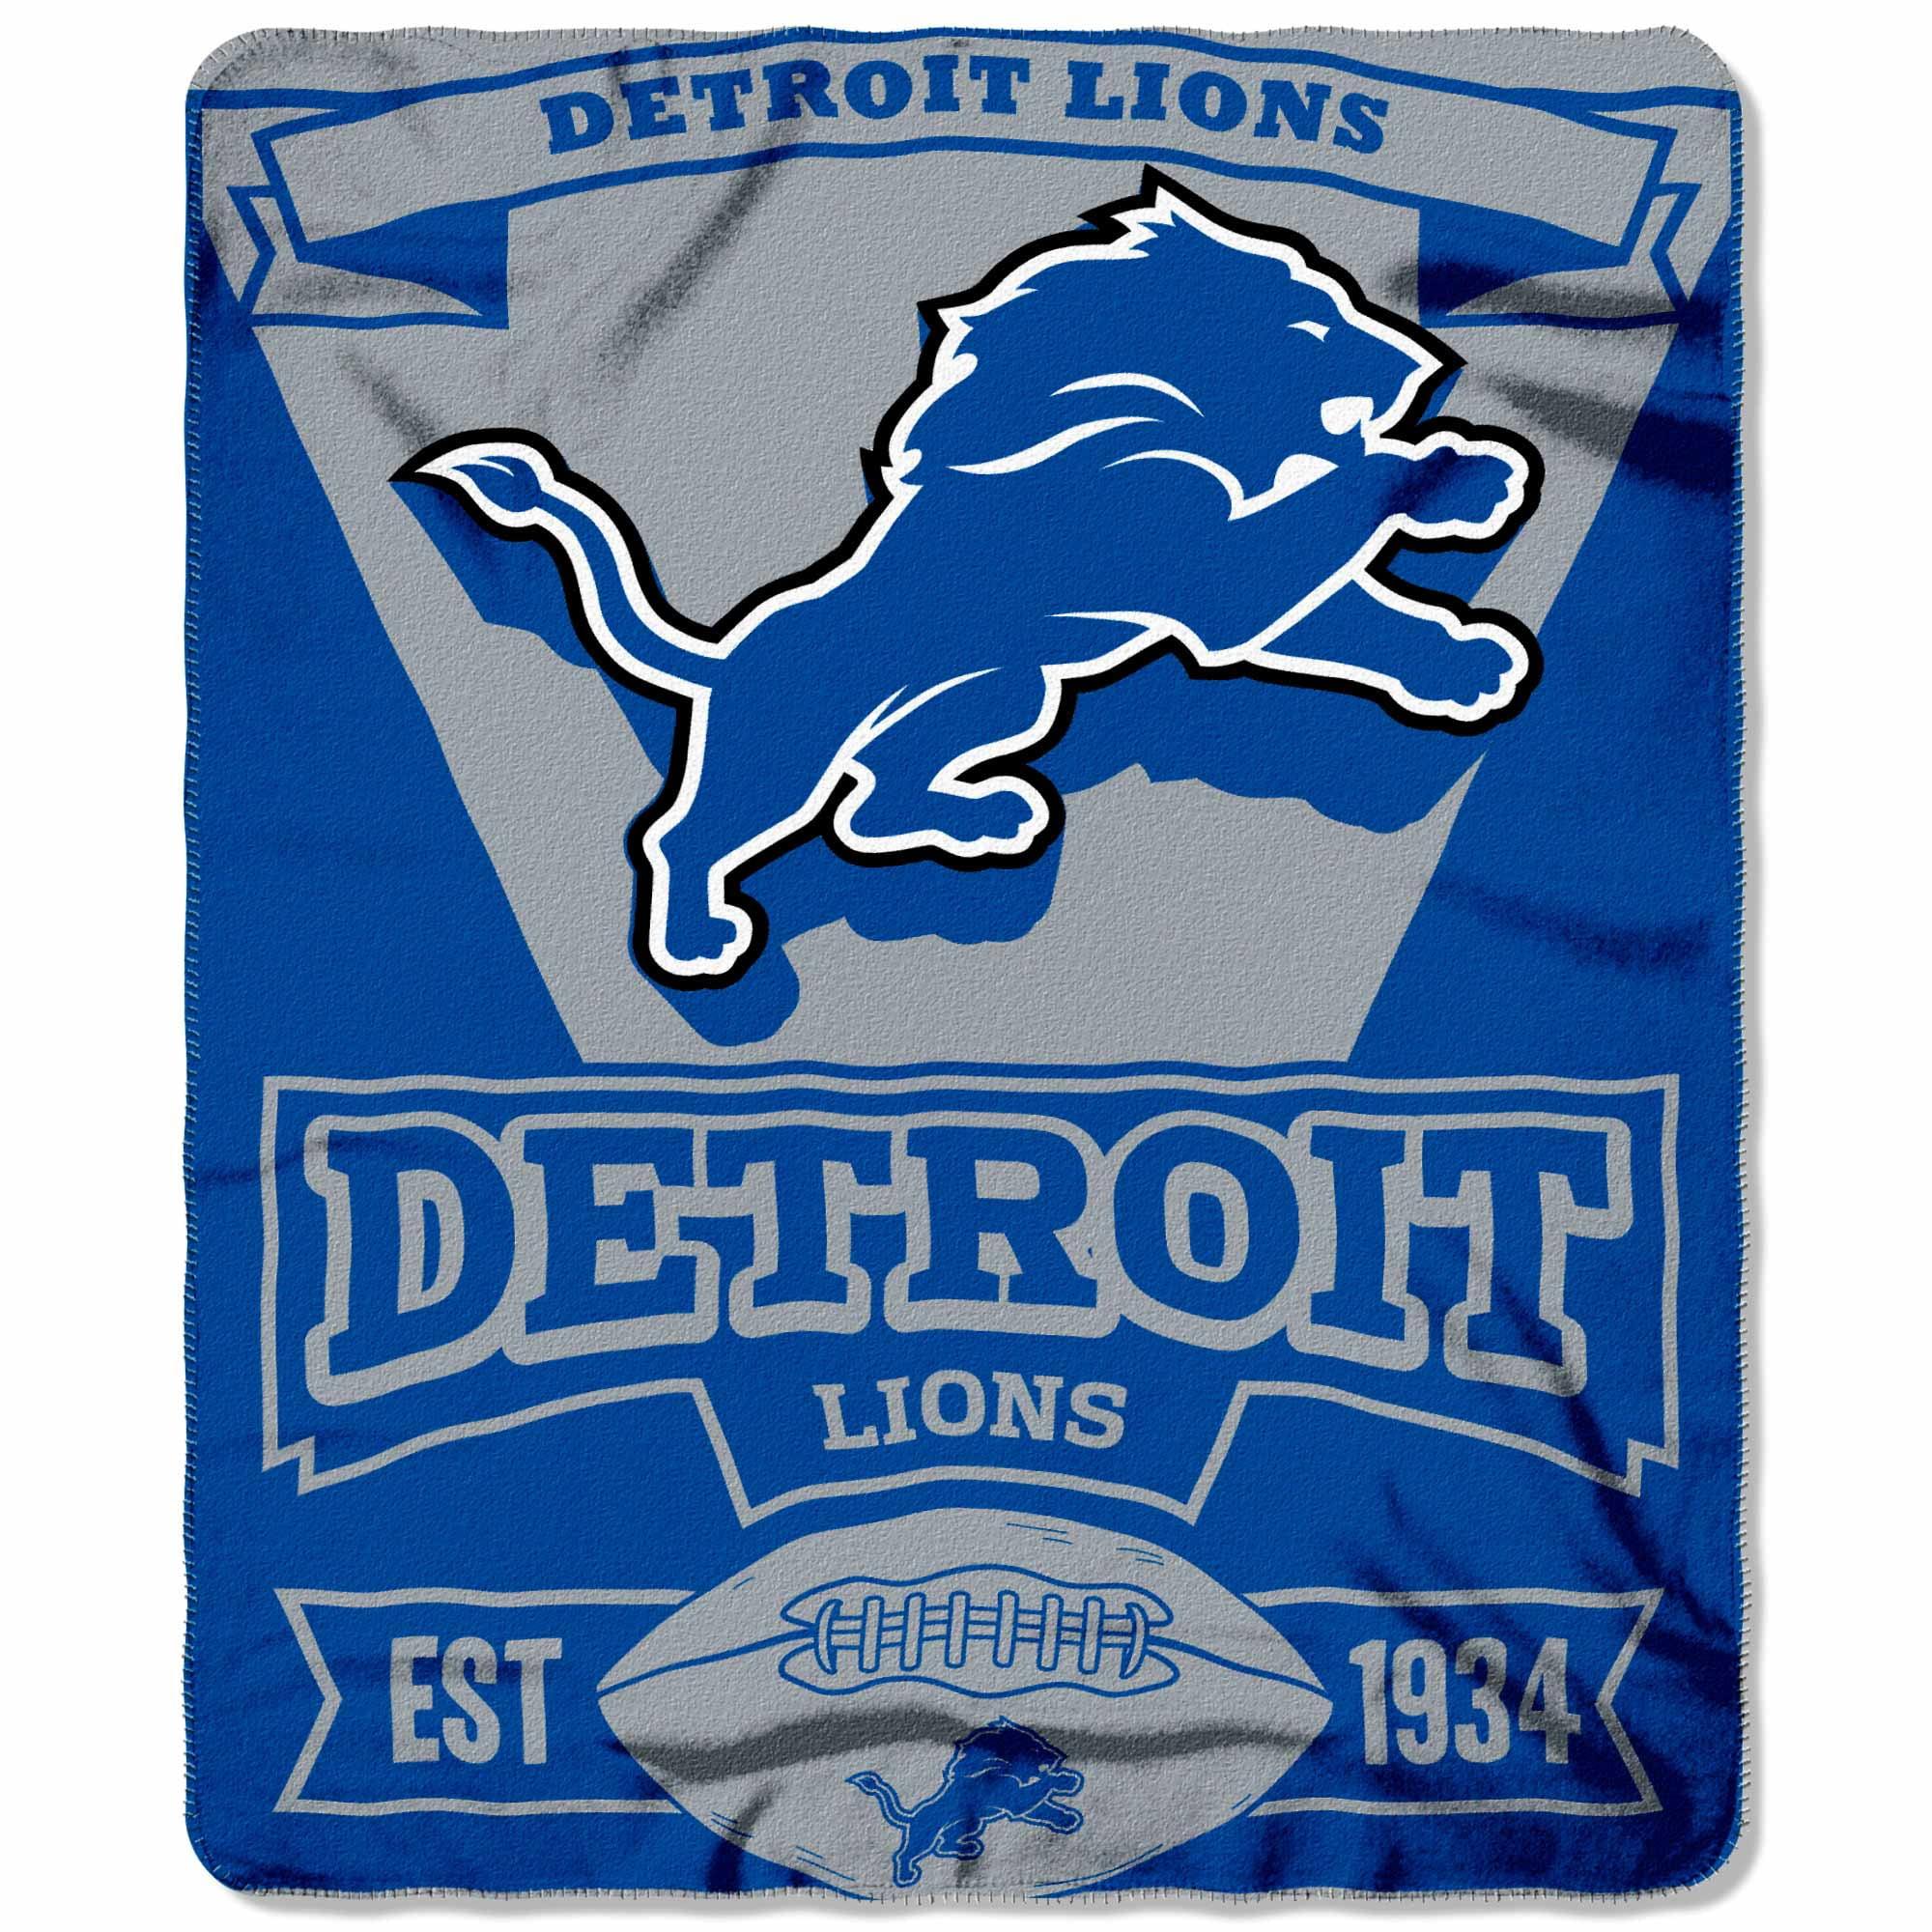 "Detroit Lions 50"" x 60"" Marque Fleece Throw Blanket - Light Blue/Silver - No Size"